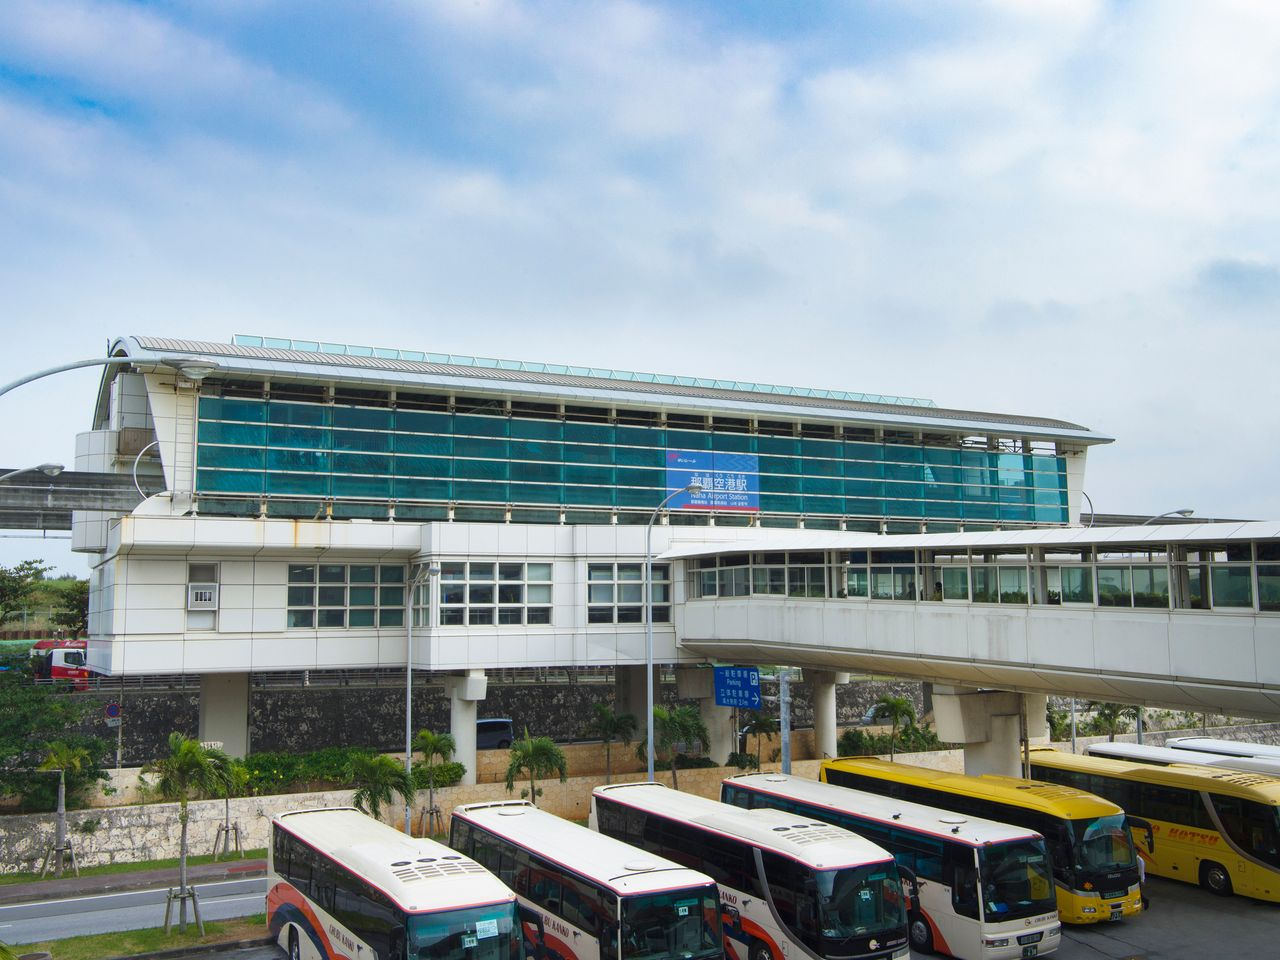 Переход на станцию «Юи-рейл» из аэропорта Наха